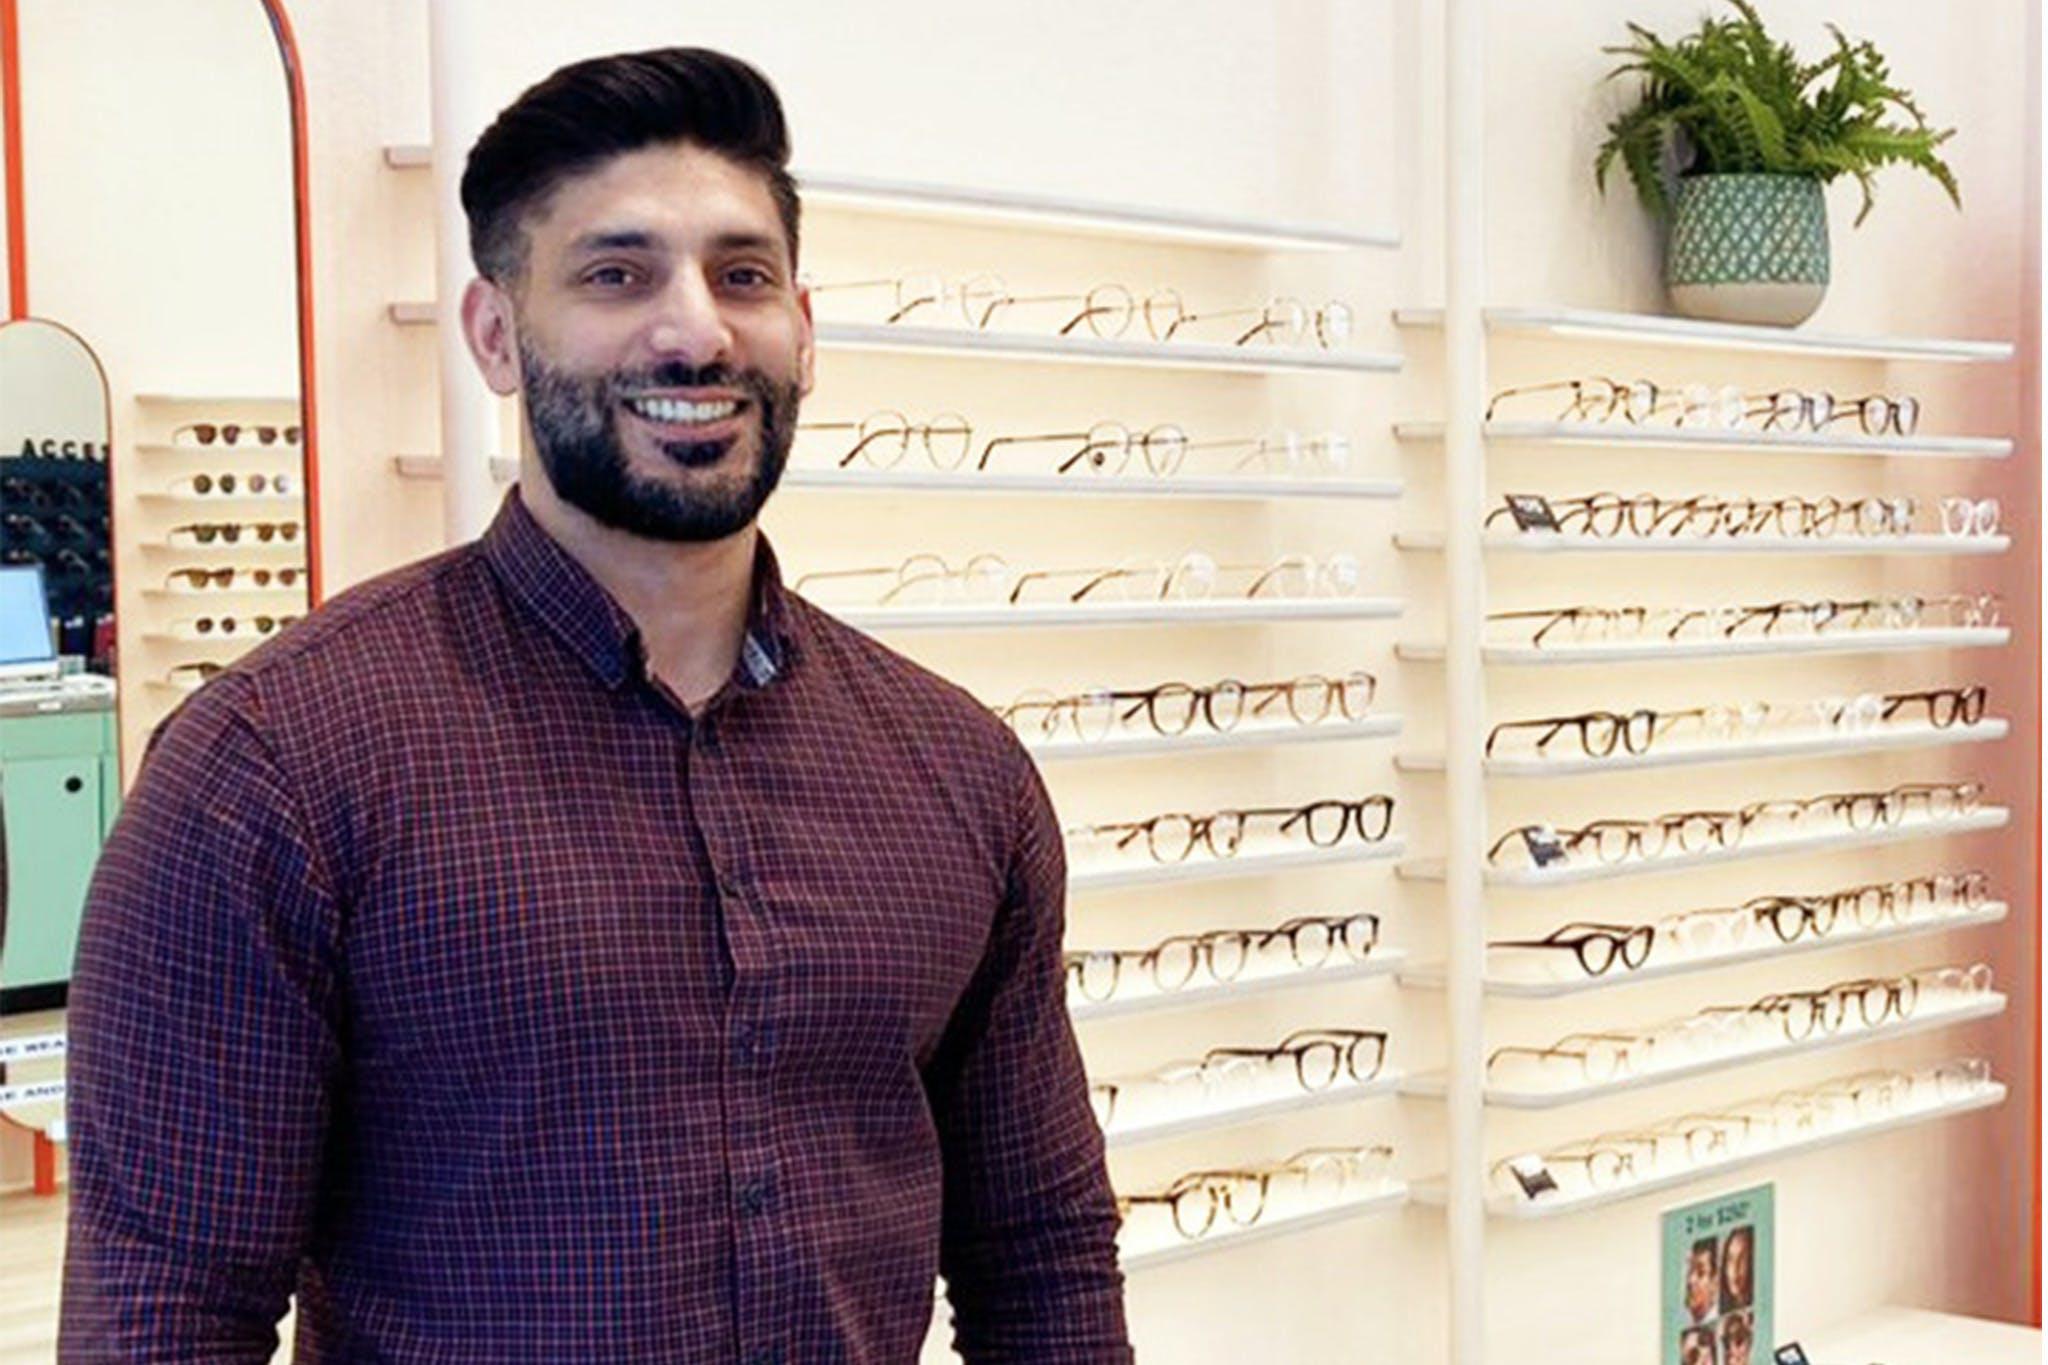 Meet your Optometrist: Dr. Aneil Sandhu